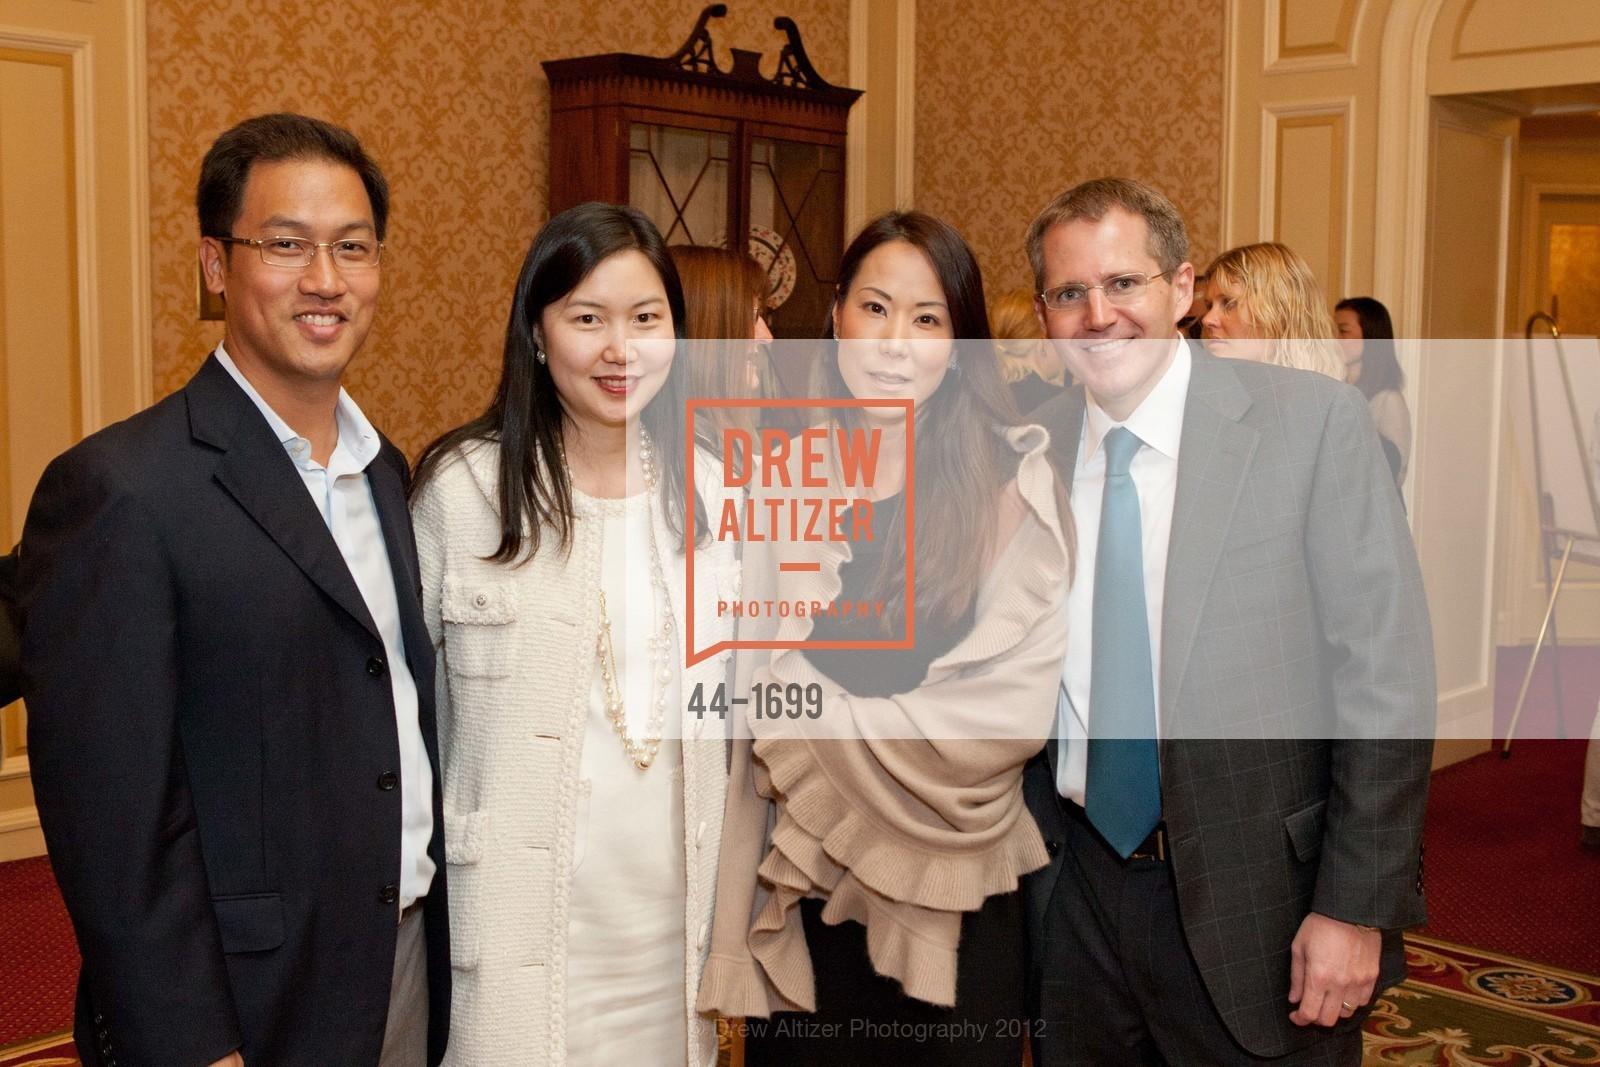 Joseph Chong, Linda Chong, Grace Dignan, James Dignan, Photo #44-1699